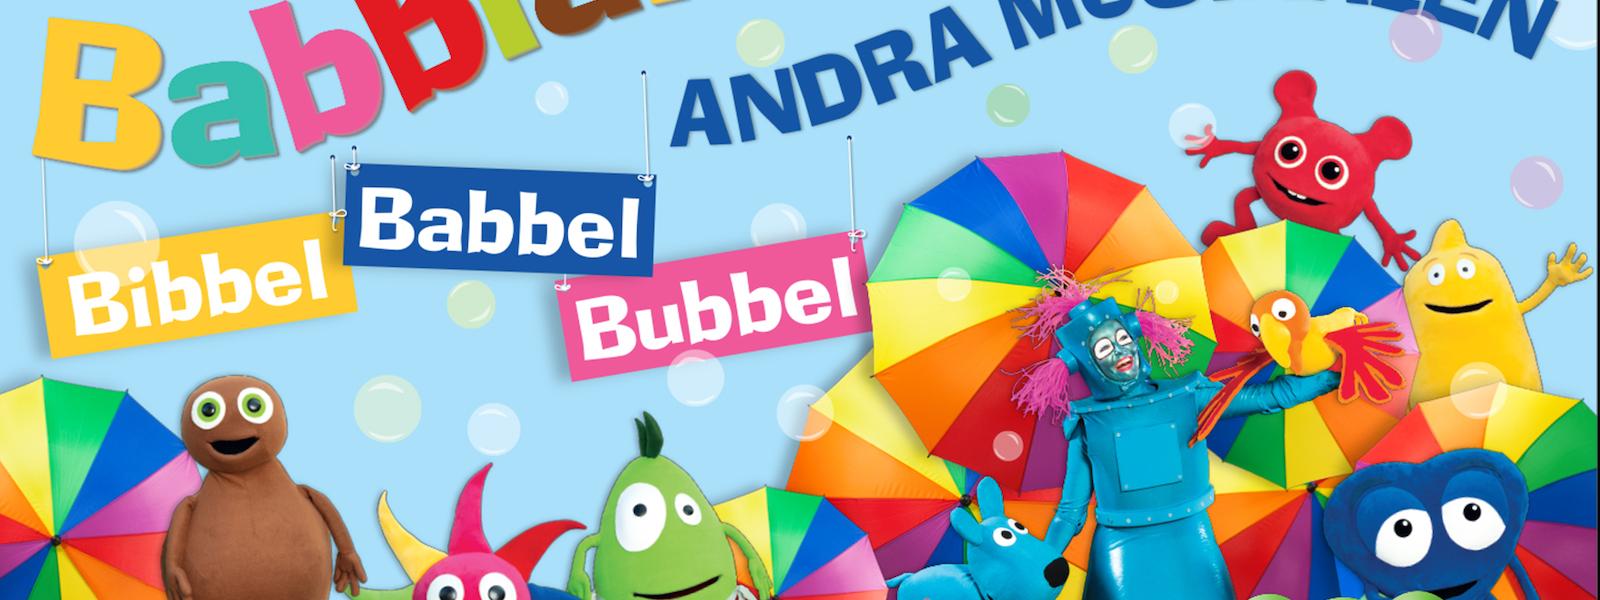 Bild - Babblarna Andra Musikalen - Bibbel Babbel Bubbel